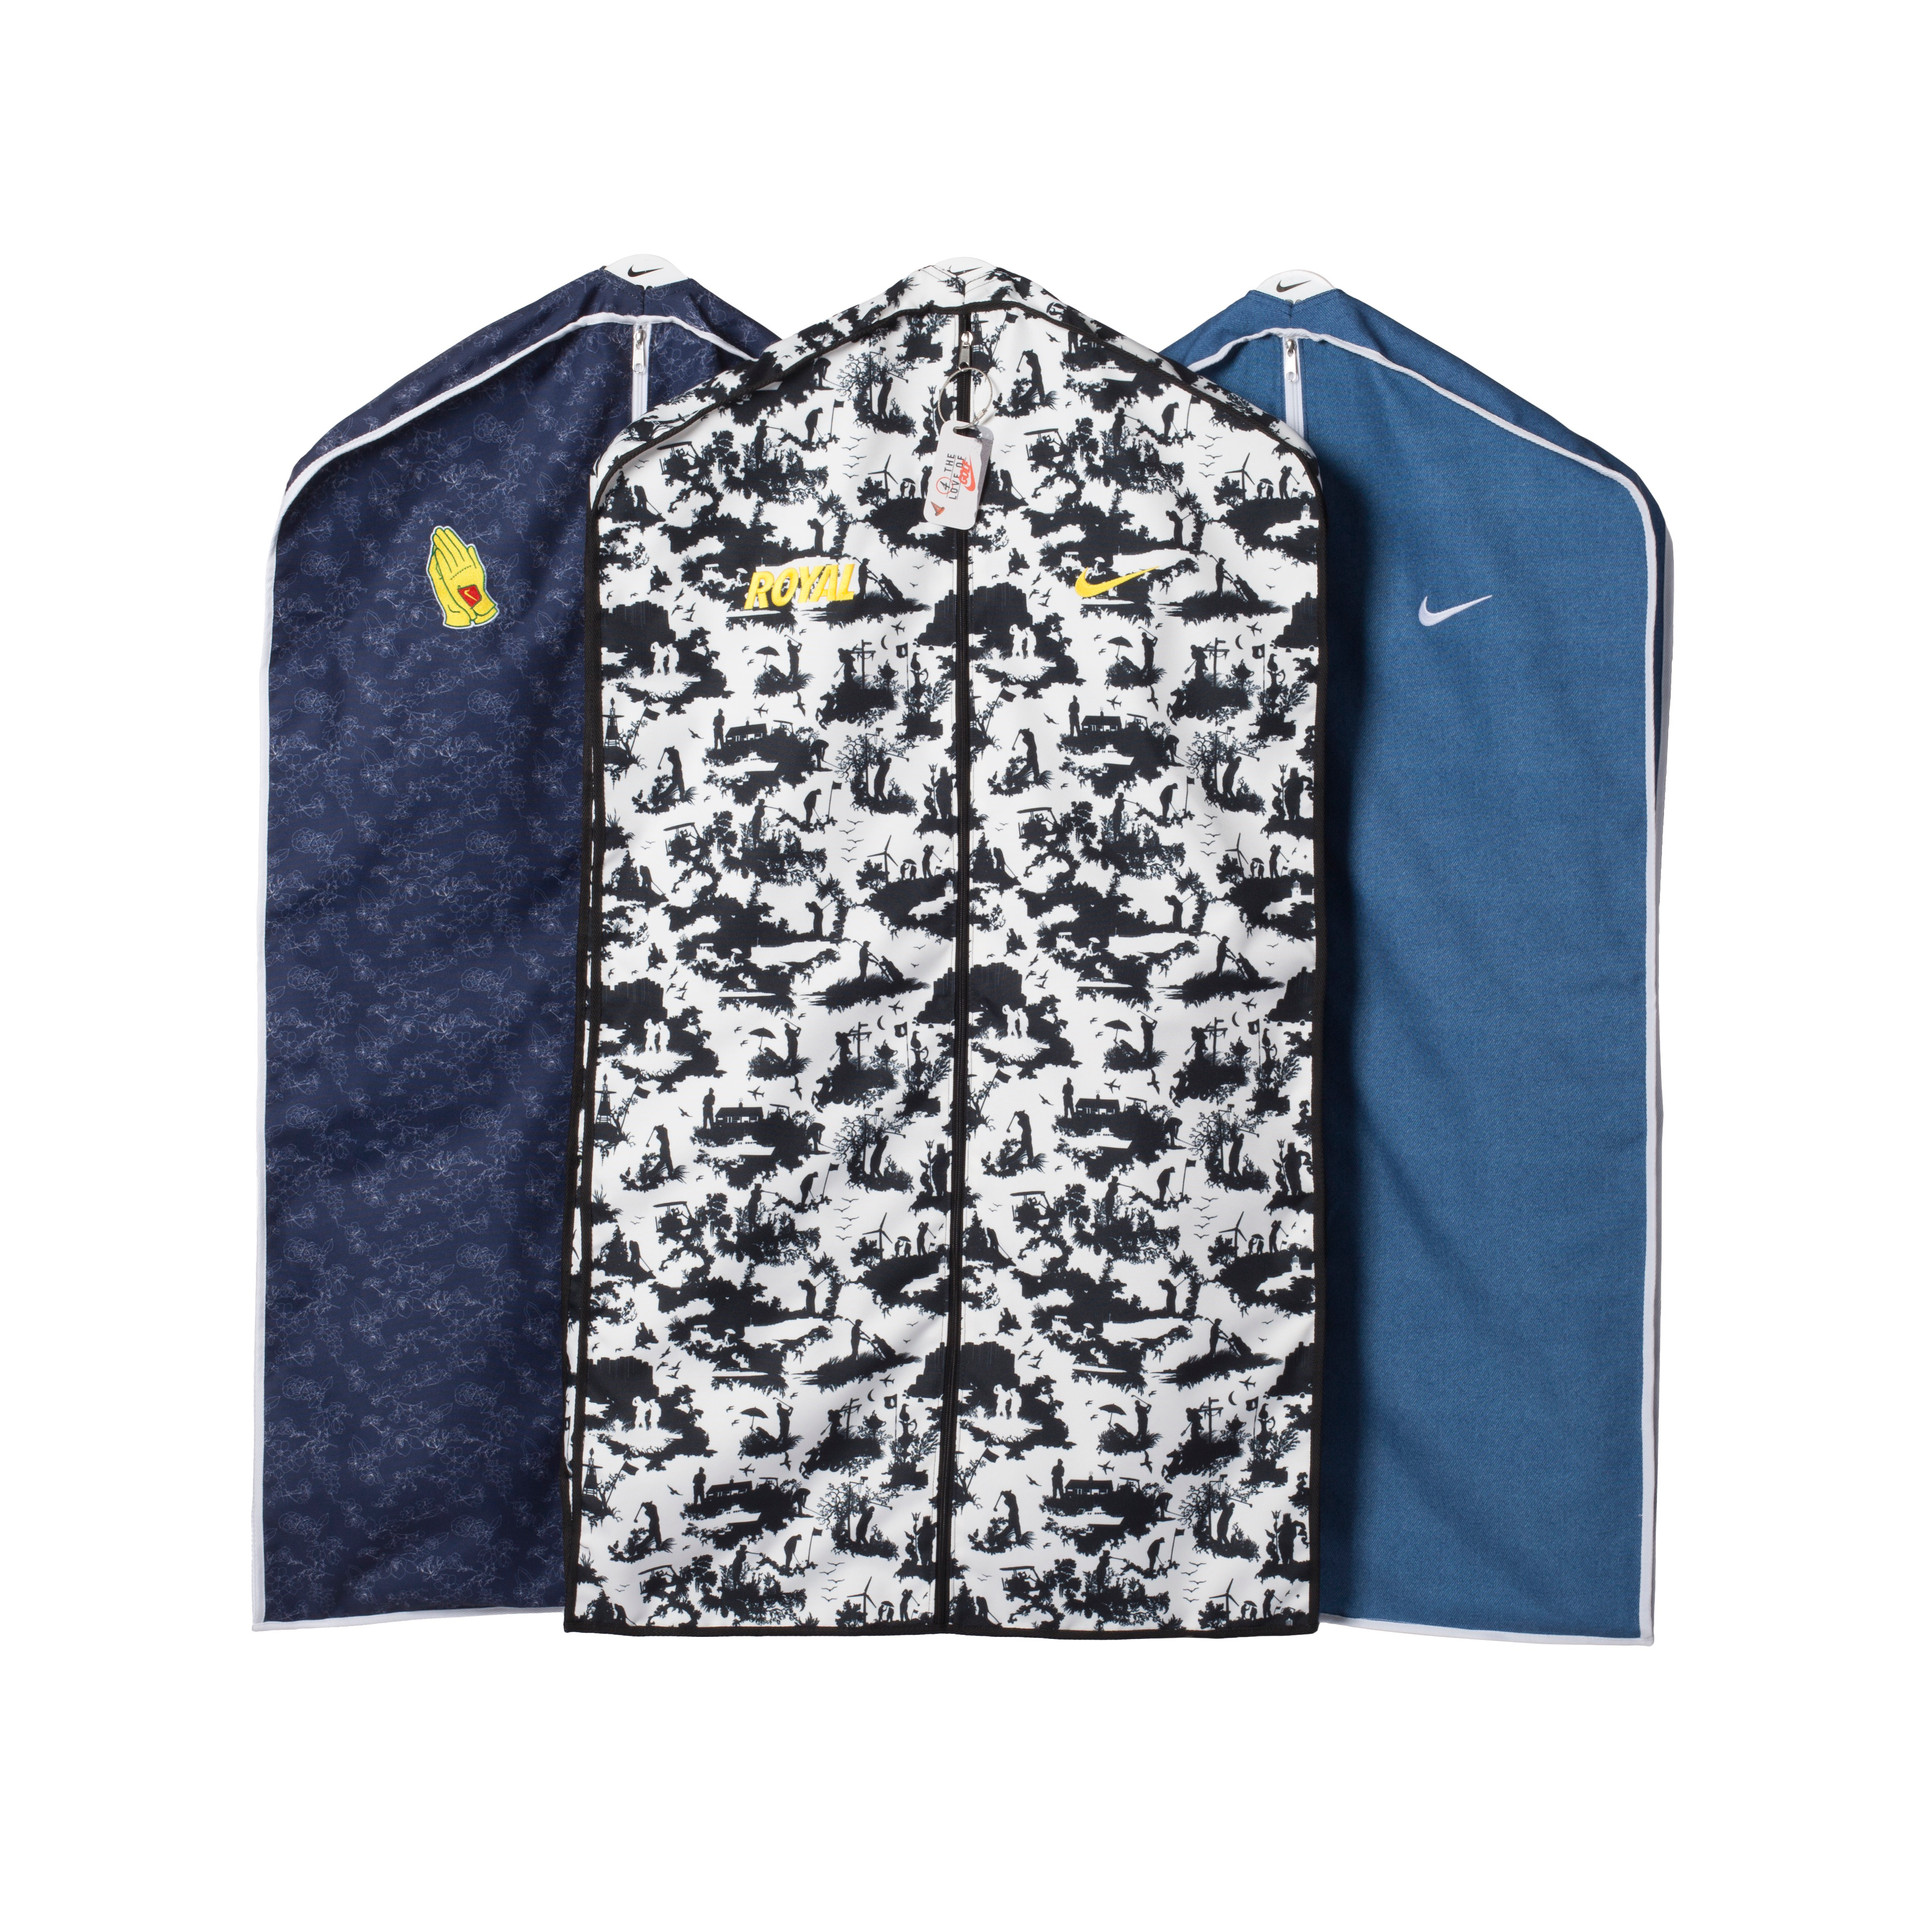 Nike Golf 2019 Majors Garment Bags